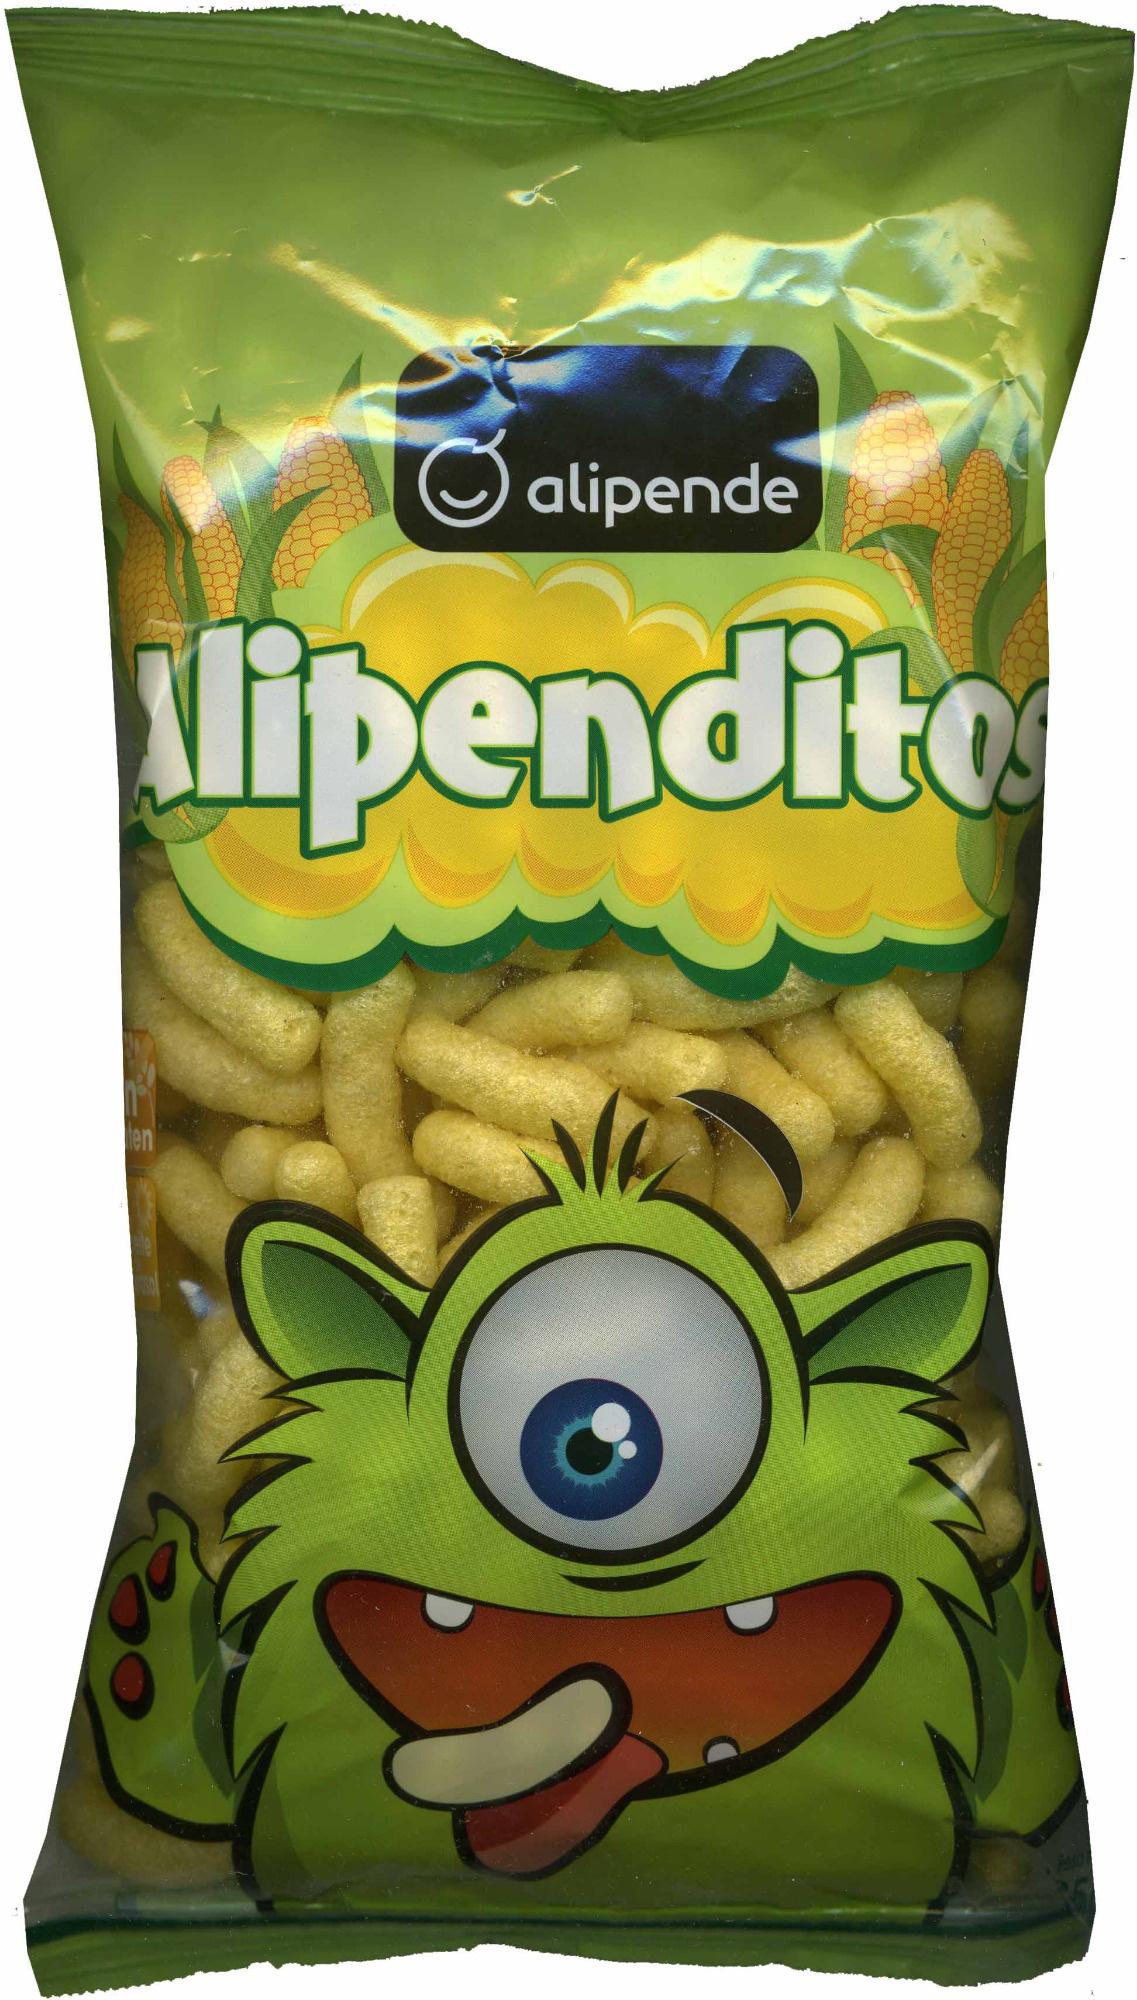 Alipenditos - Product